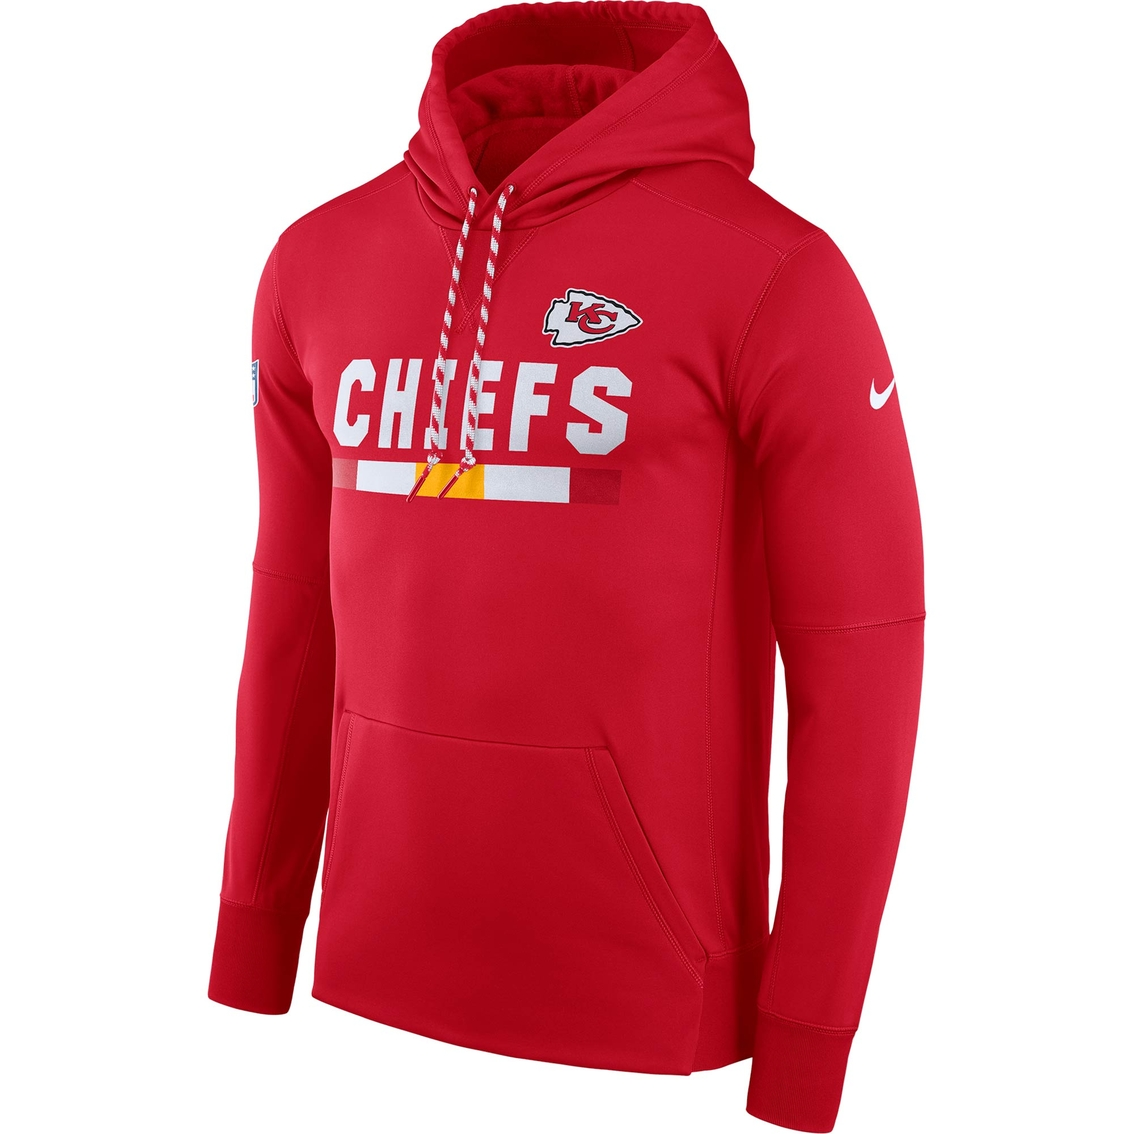 newest 5a385 5d8aa Nike Nfl Kansas City Chiefs Therma Hoodie | Hoodies ...